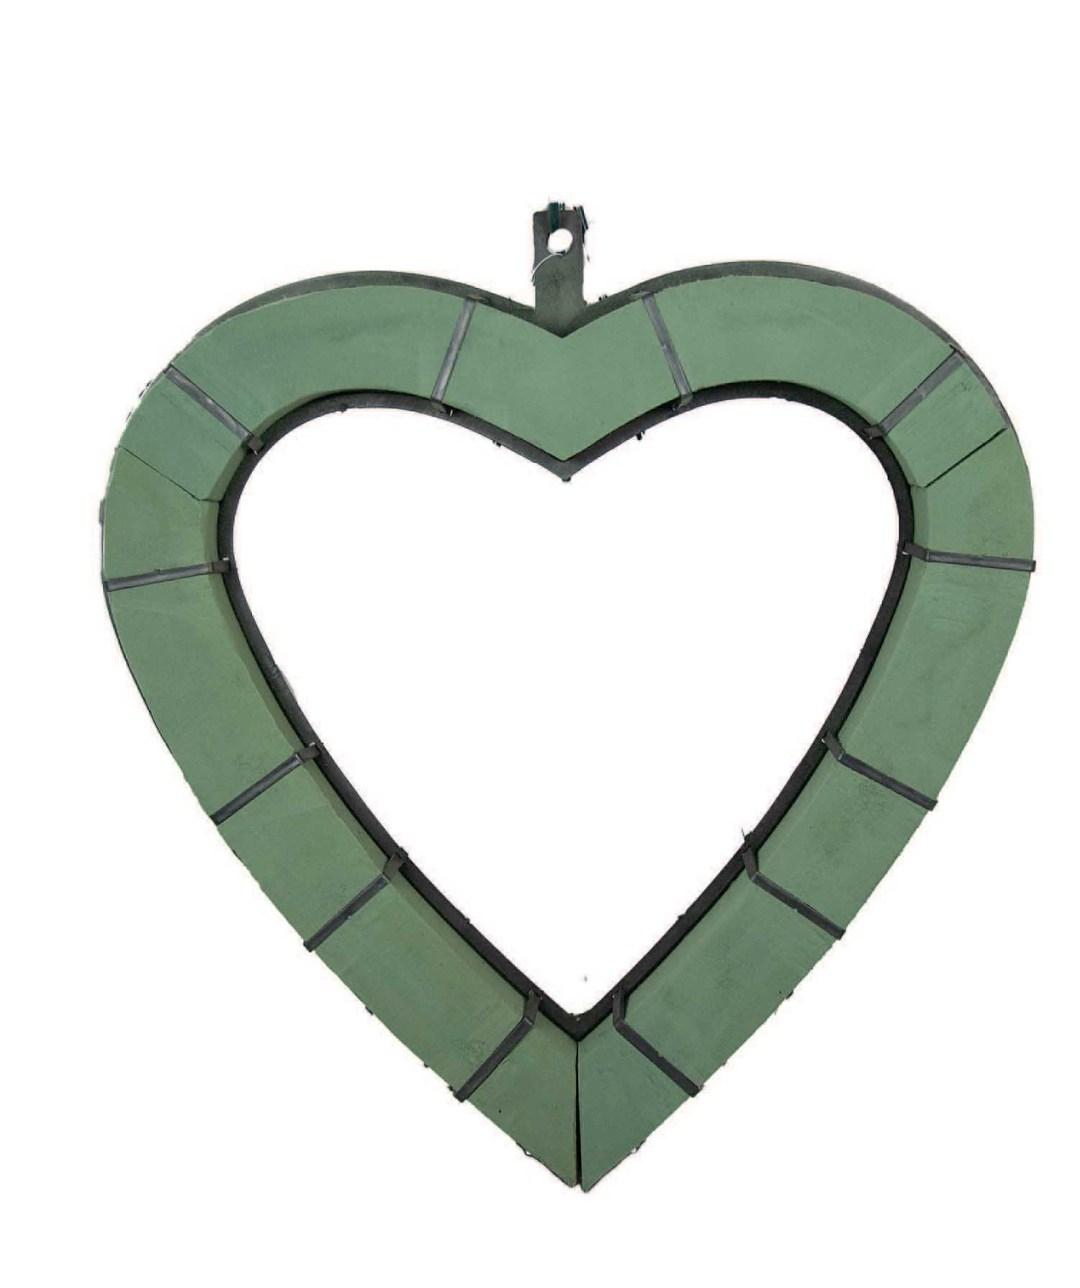 "FP318 - 19"" Plastic back heart shaped wet block heart FP318"